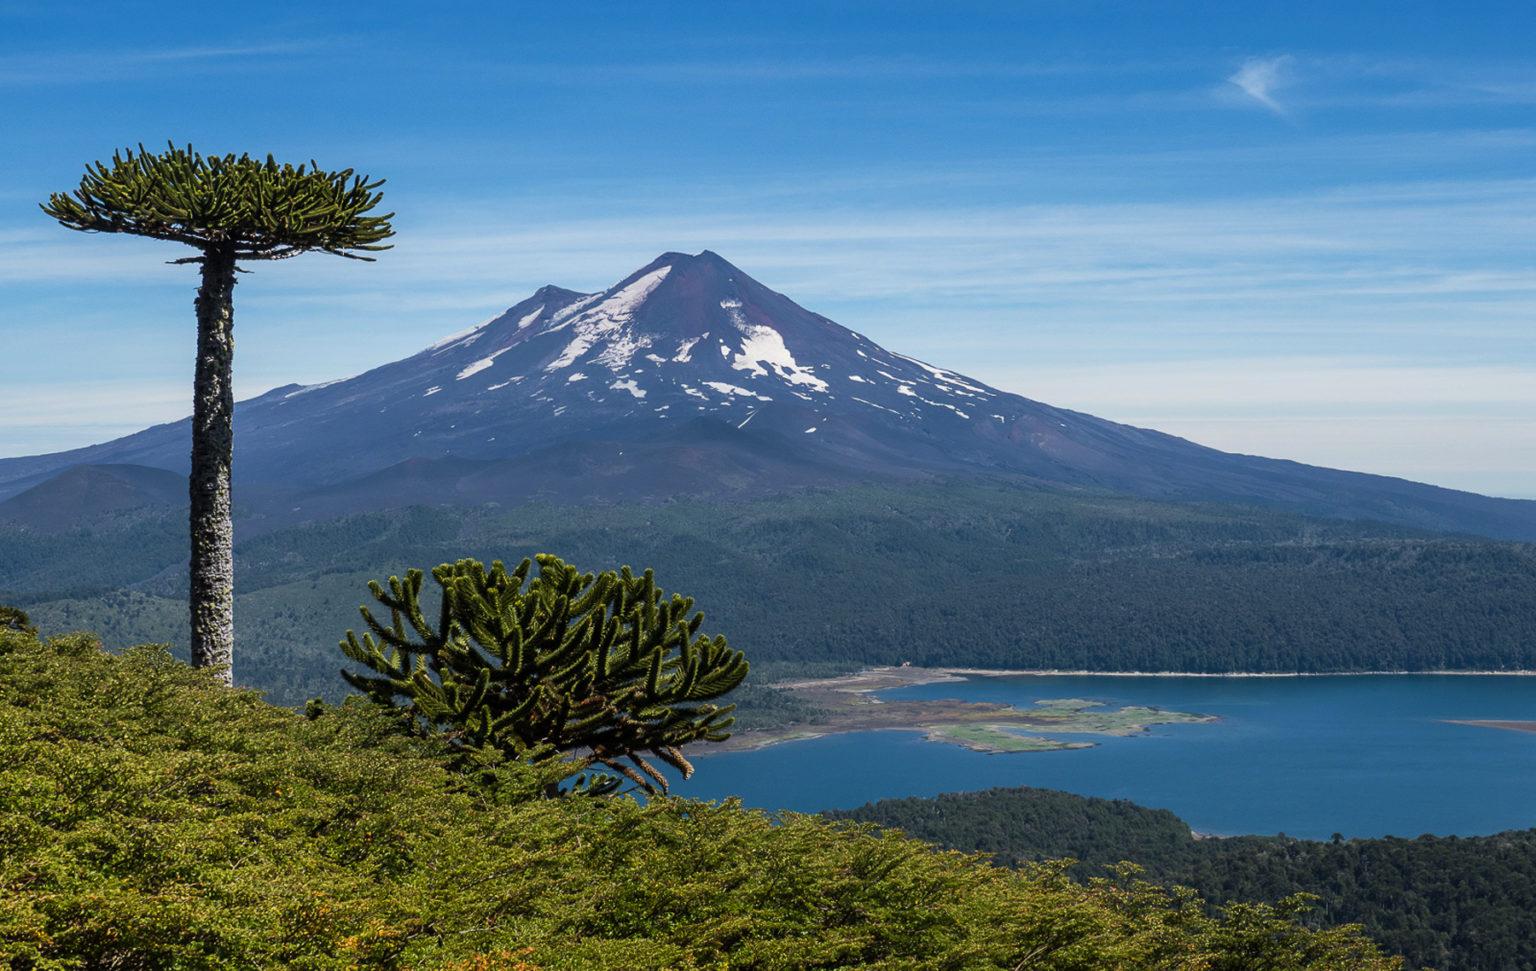 Ein guten Blick auf den Vulkan Llaima